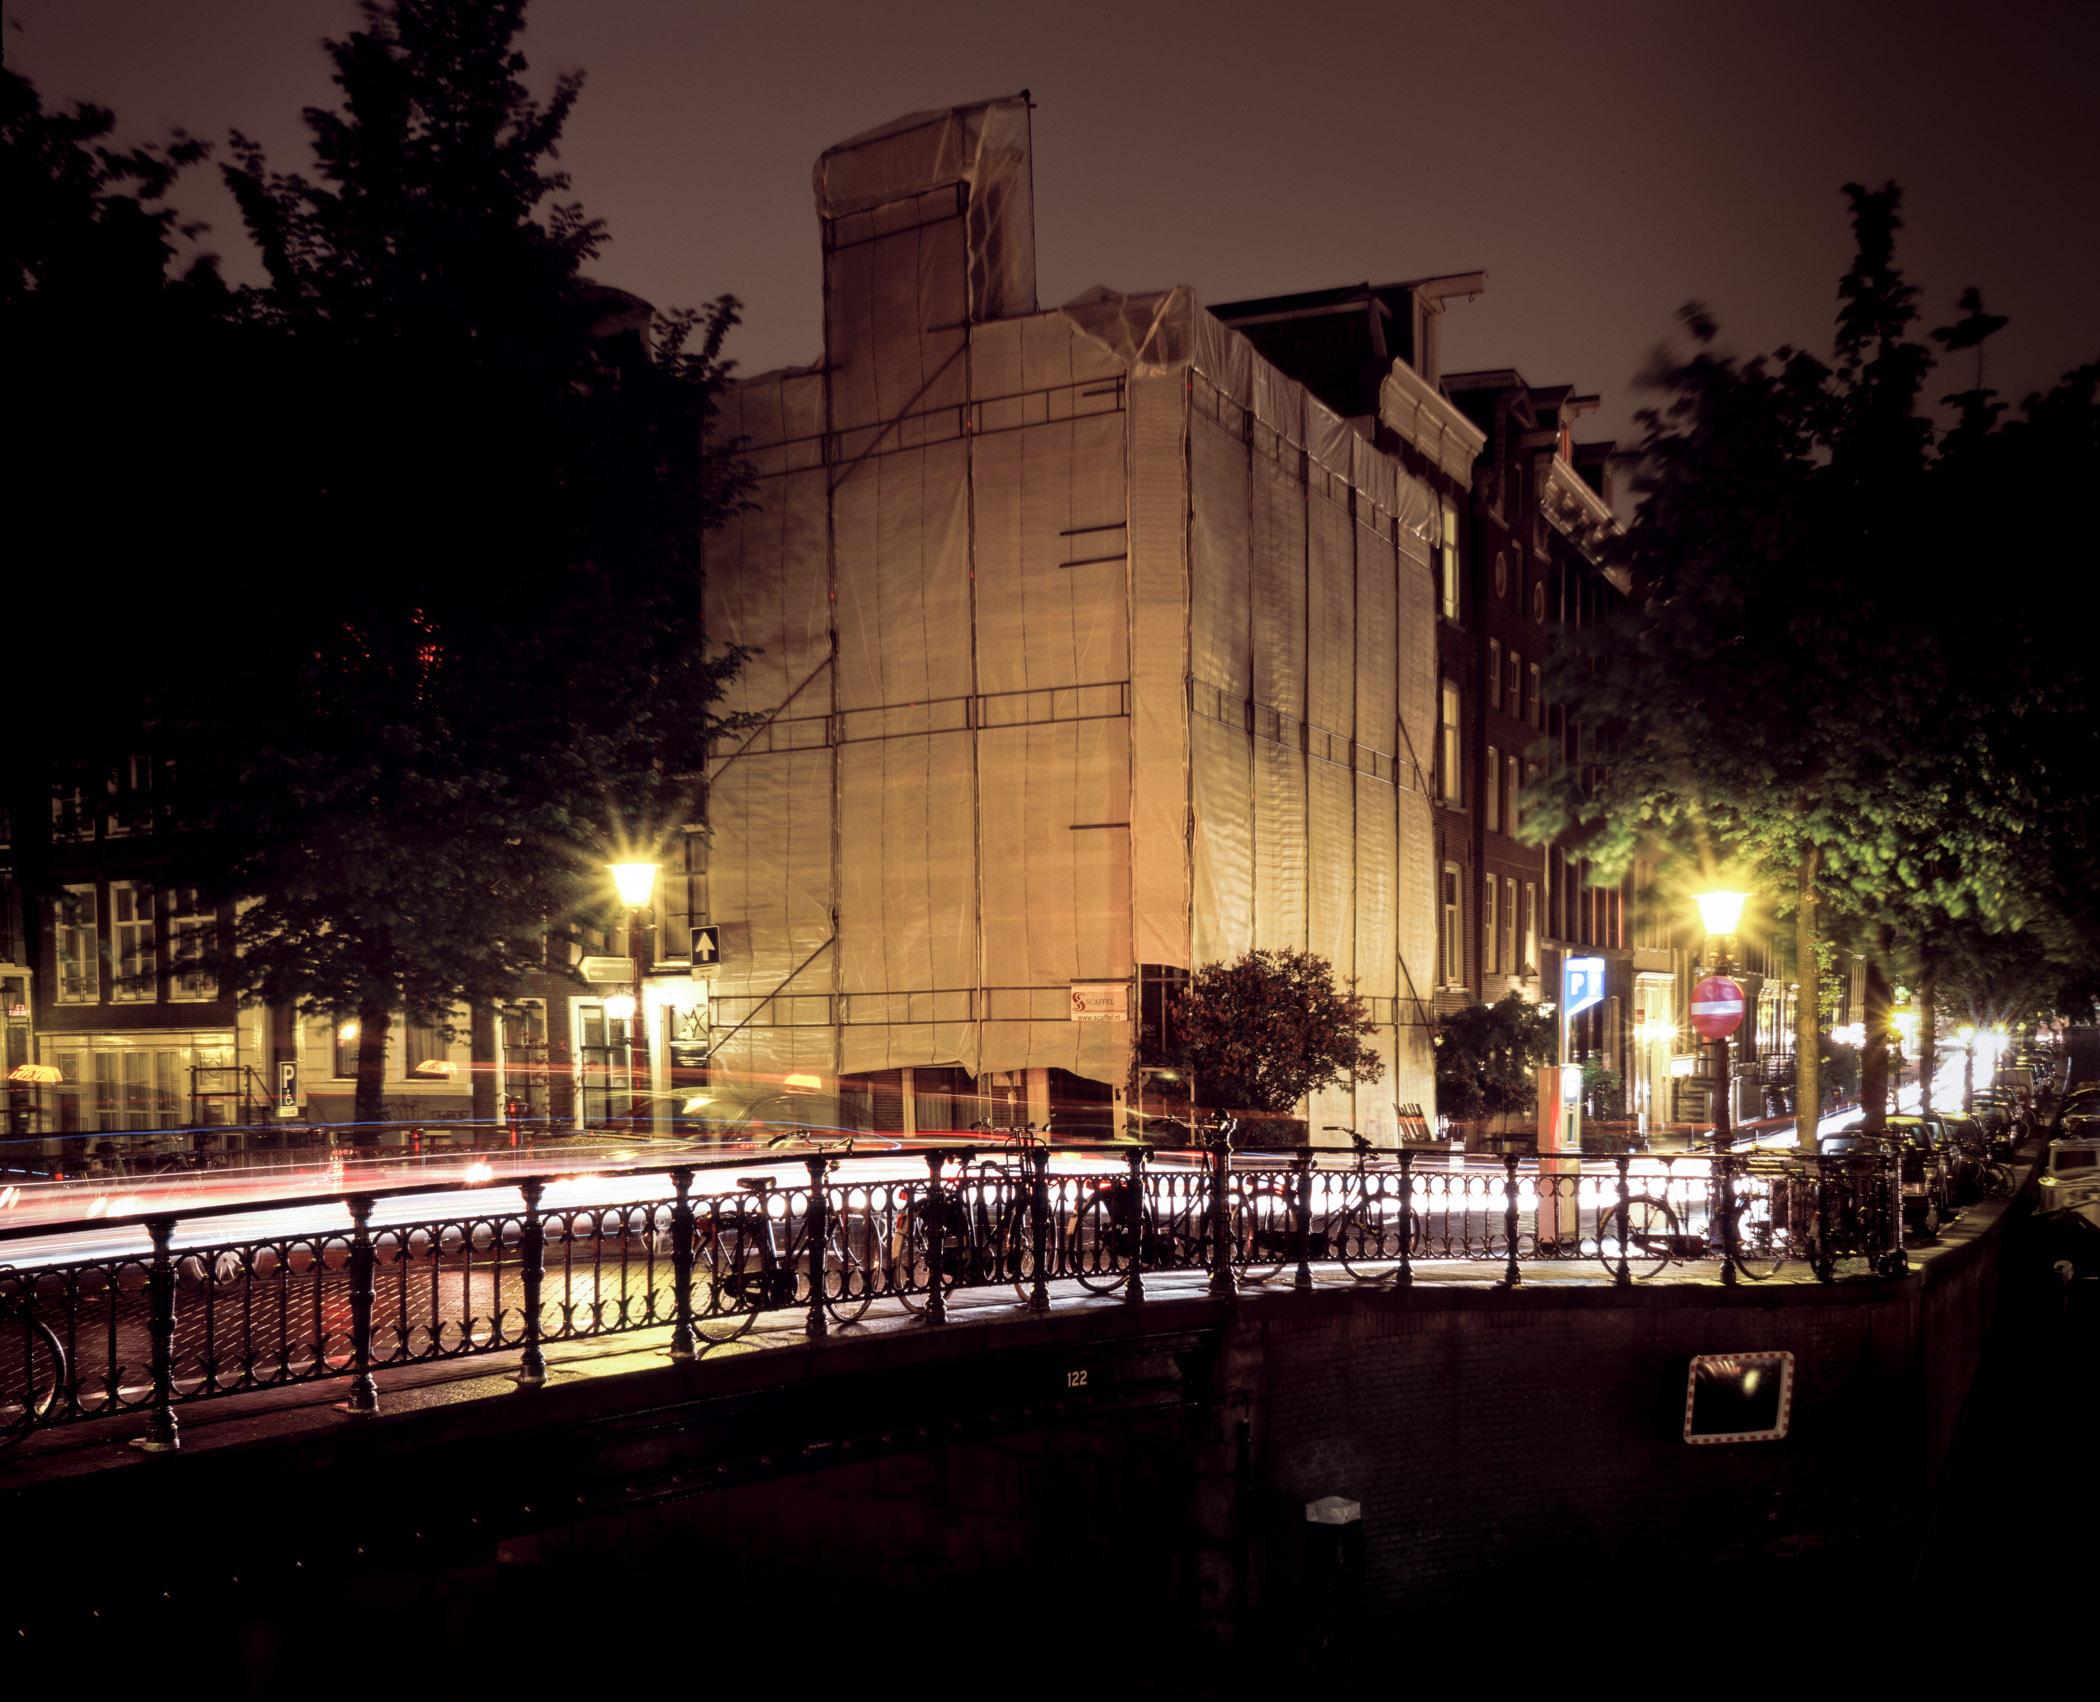 Prinsengracht / Leidsegracht, Amsterdam